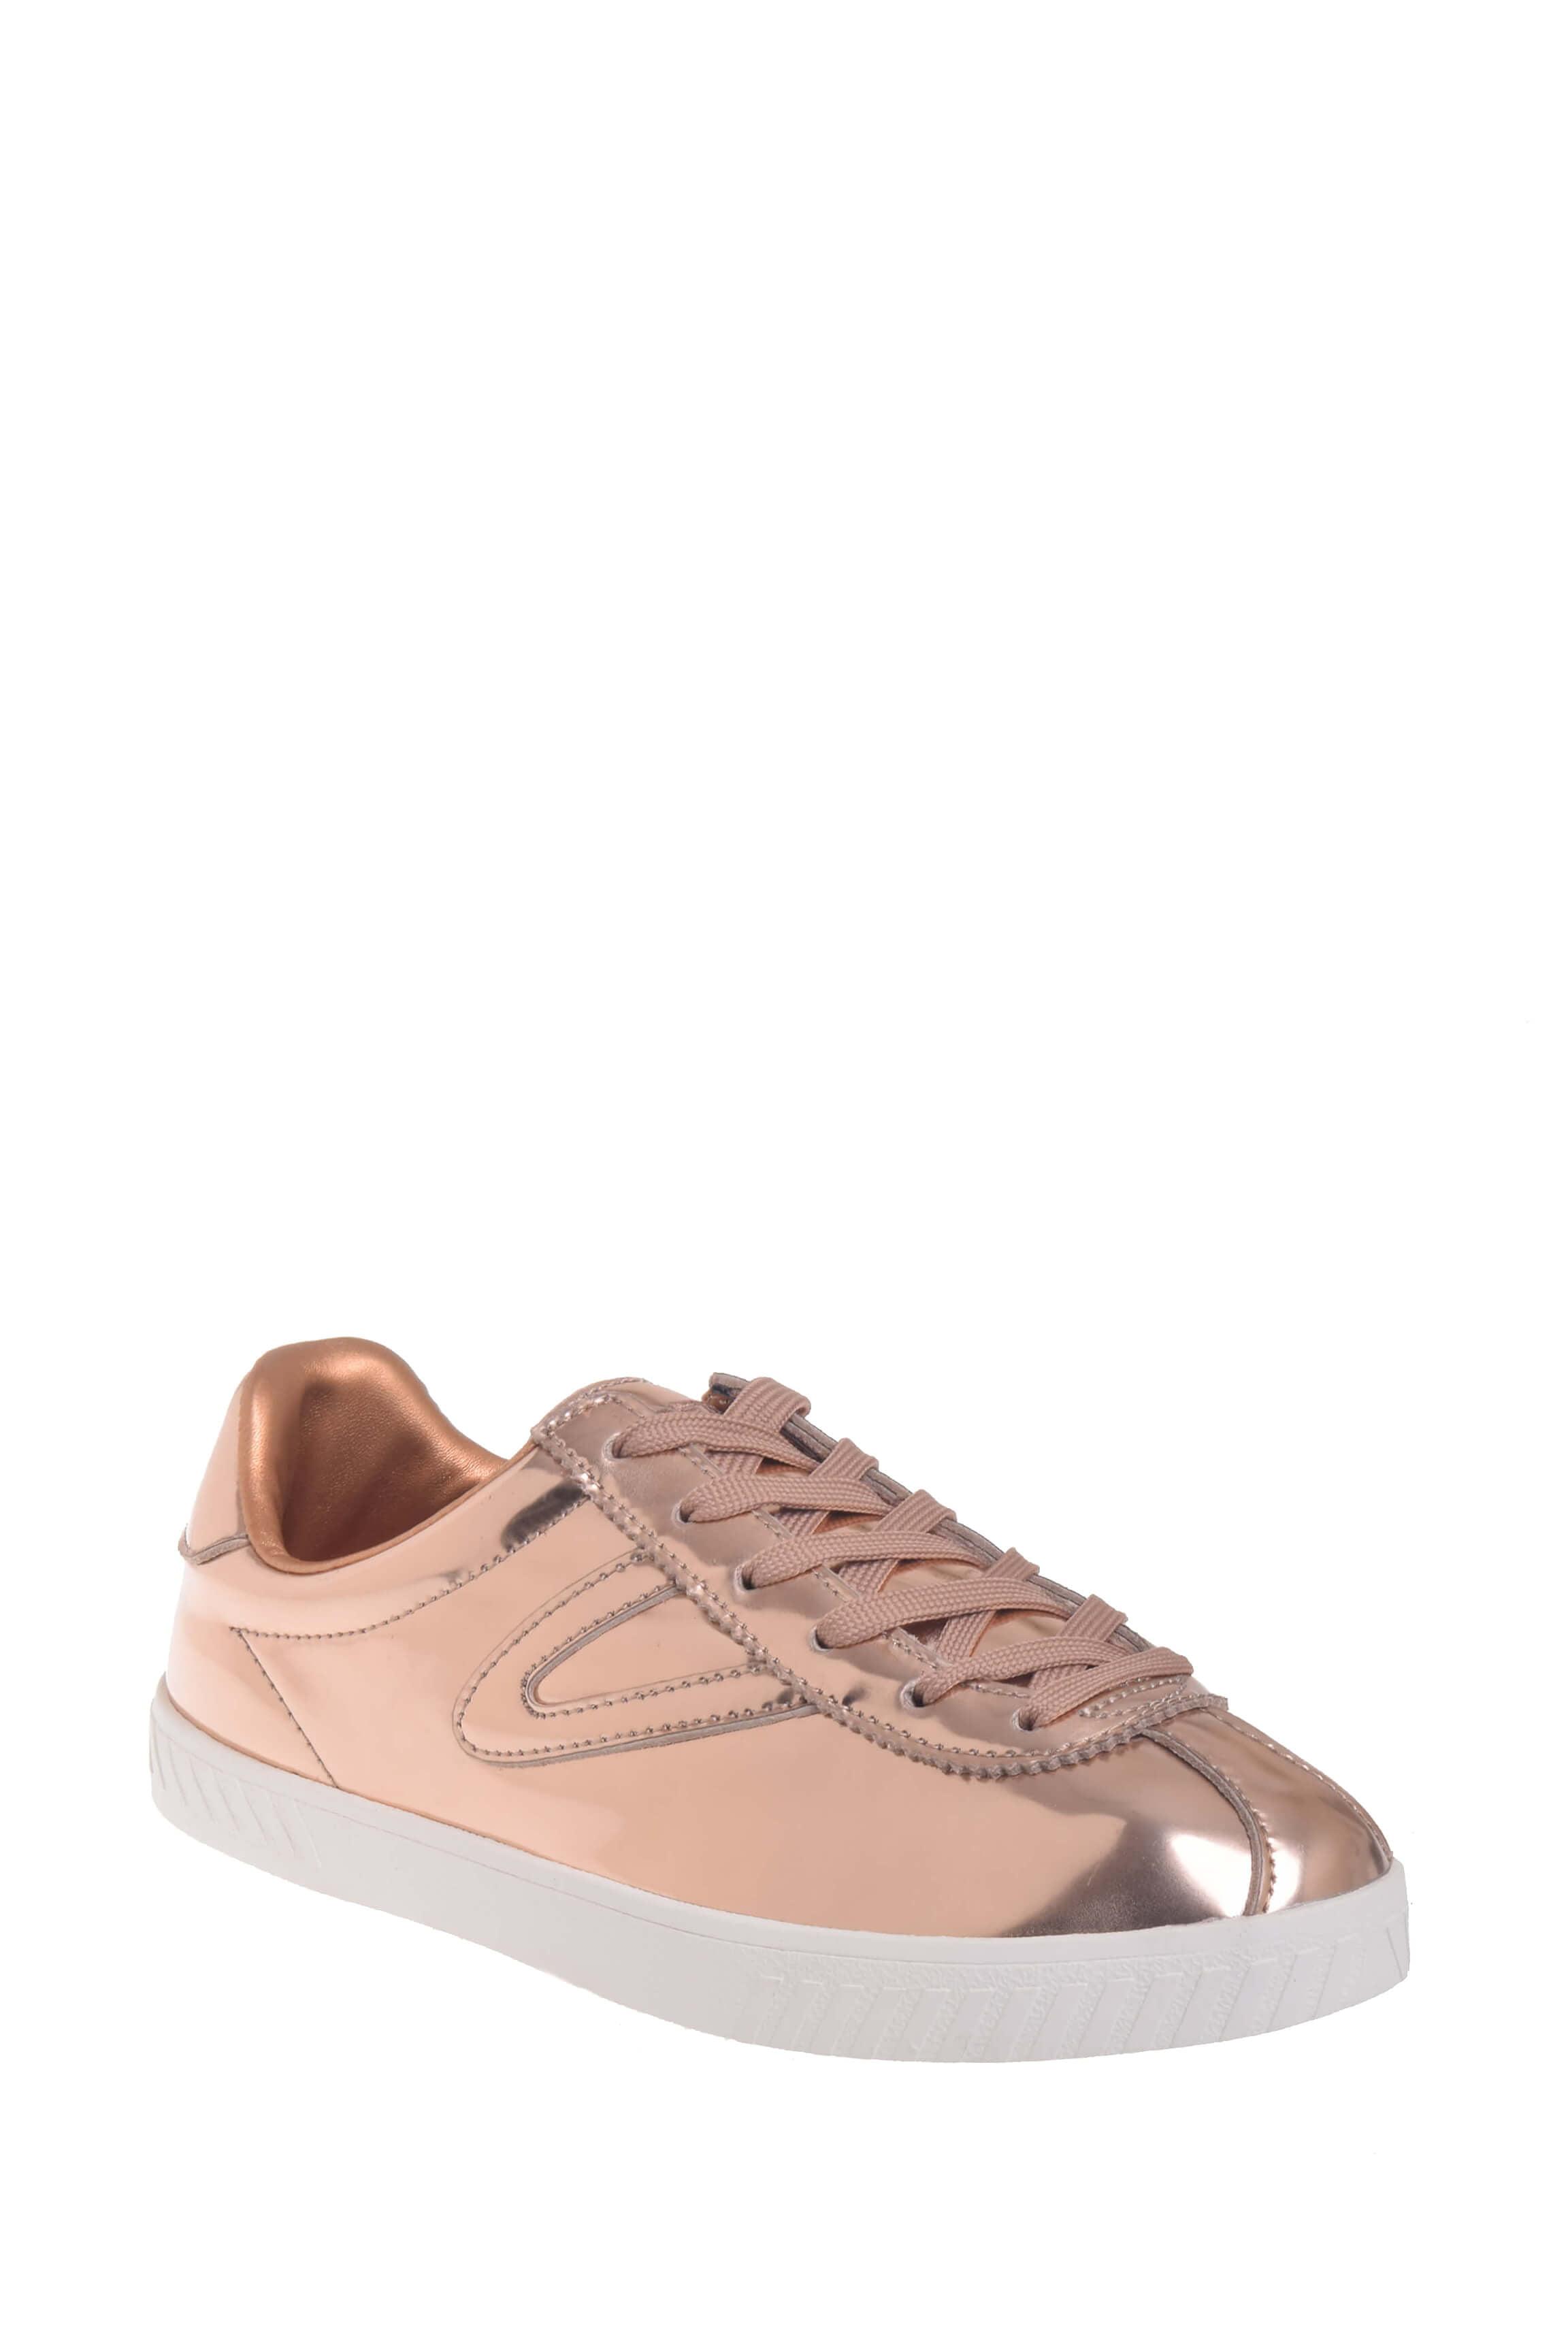 Tretorn W Camden 2 Low Top Sneaker Magnolia Metallic by